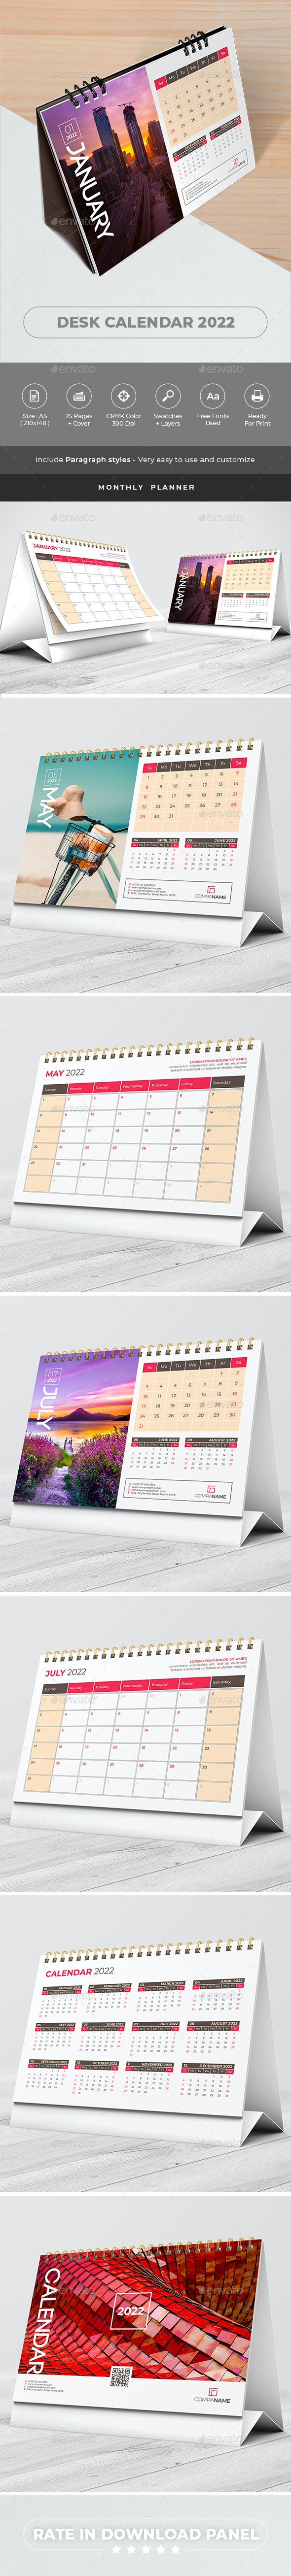 Desk Calendar Planner 2022 - Calendars Stationery